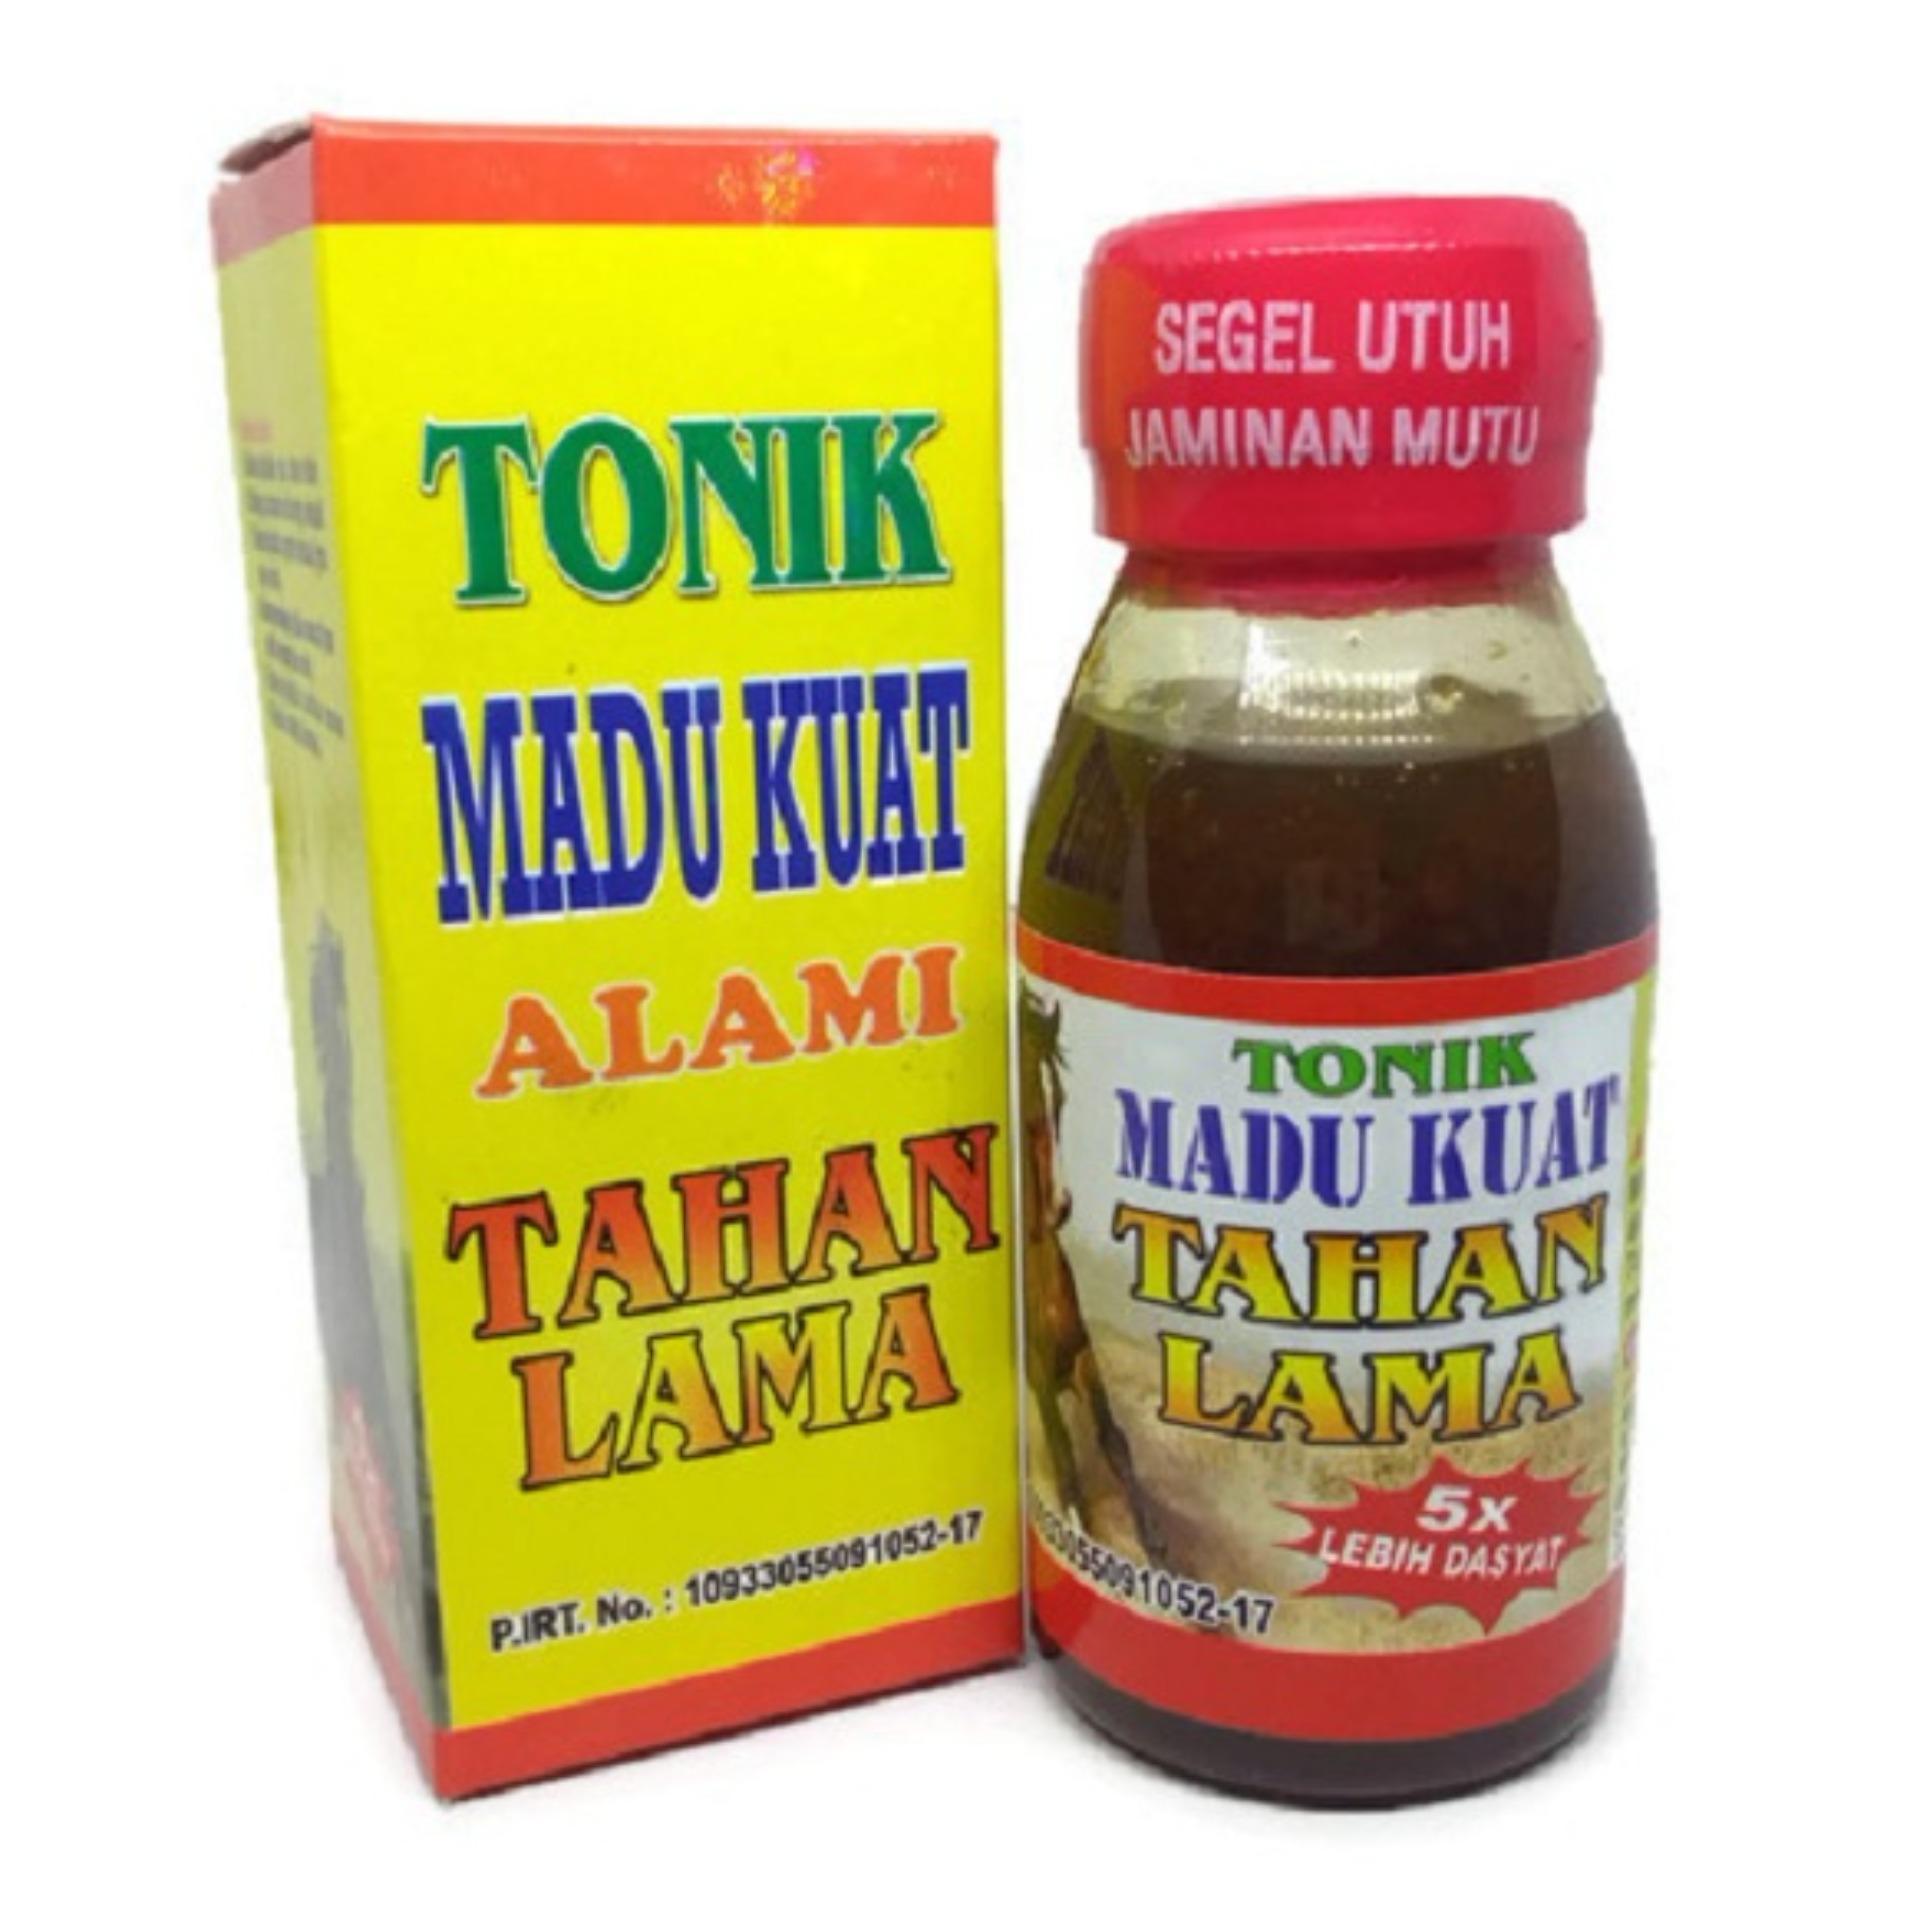 Buy Sell Cheapest Madu Tonix Kuat Best Quality Product Deals Lanang Original Super Alami Tonik 5x